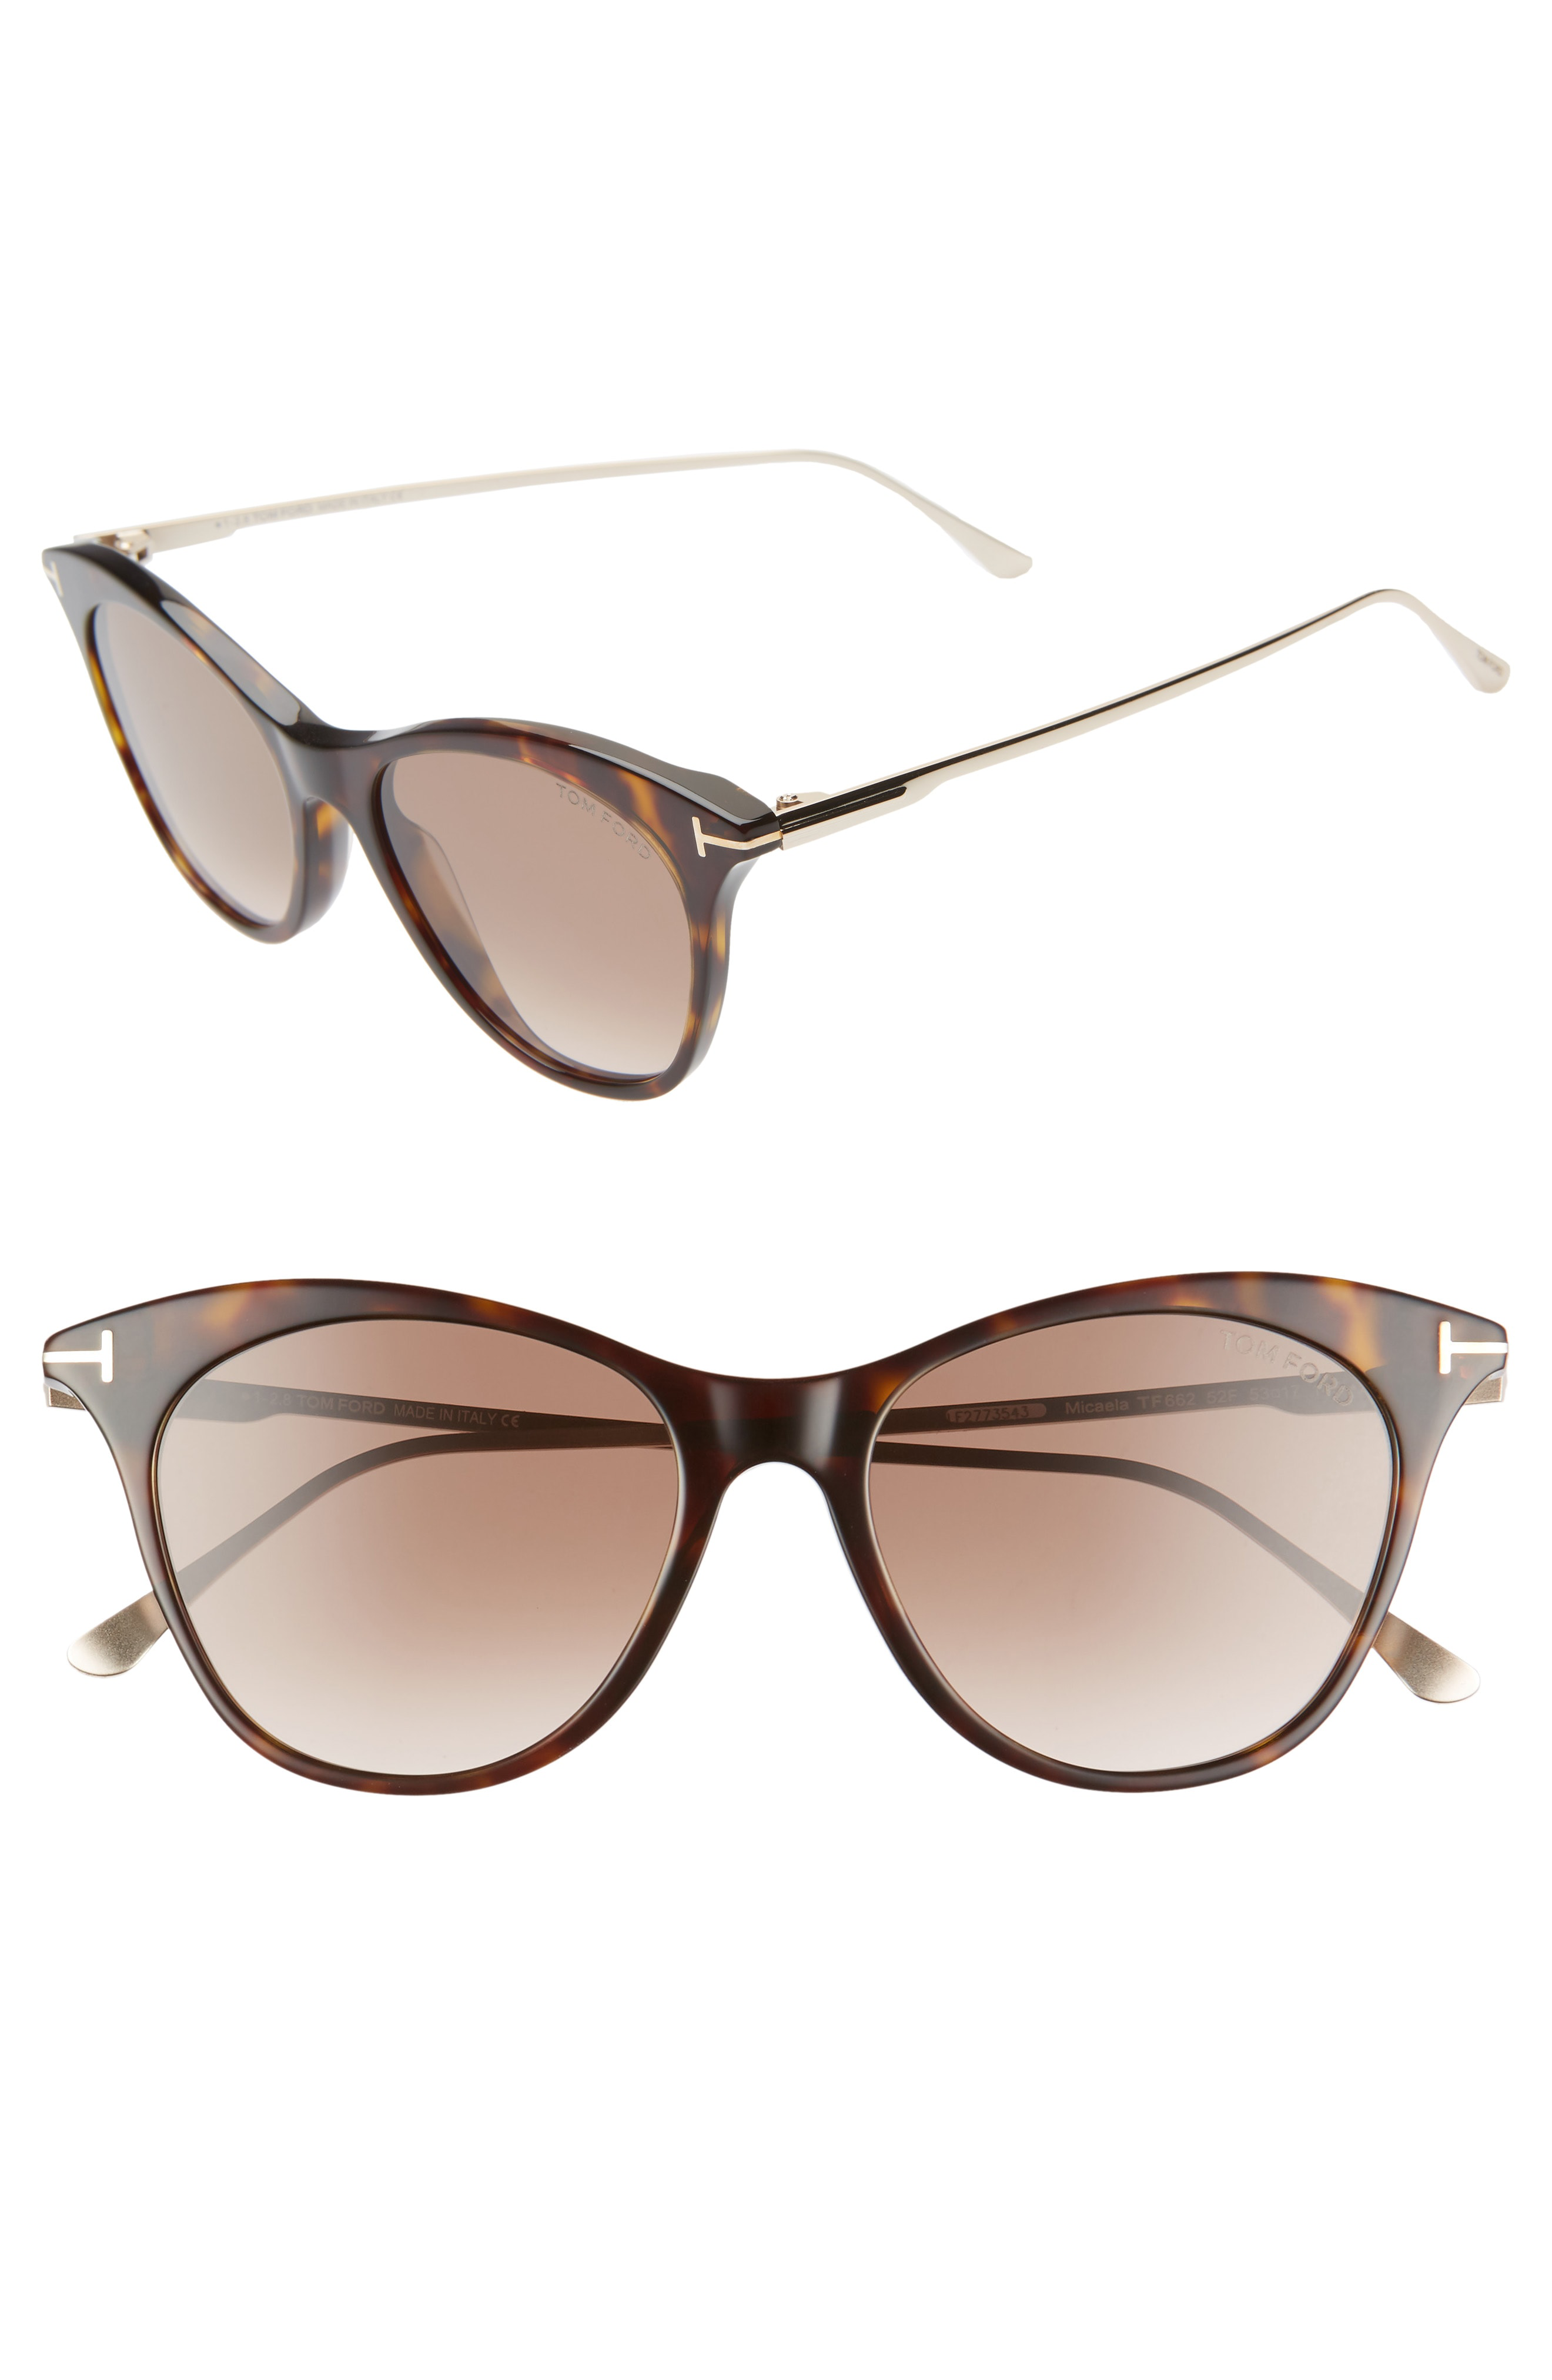 f6cc4e4d9199 Tom Ford Micaela 53Mm Cat Eye Sunglasses - Havana  Rose Gold  Pink Gold